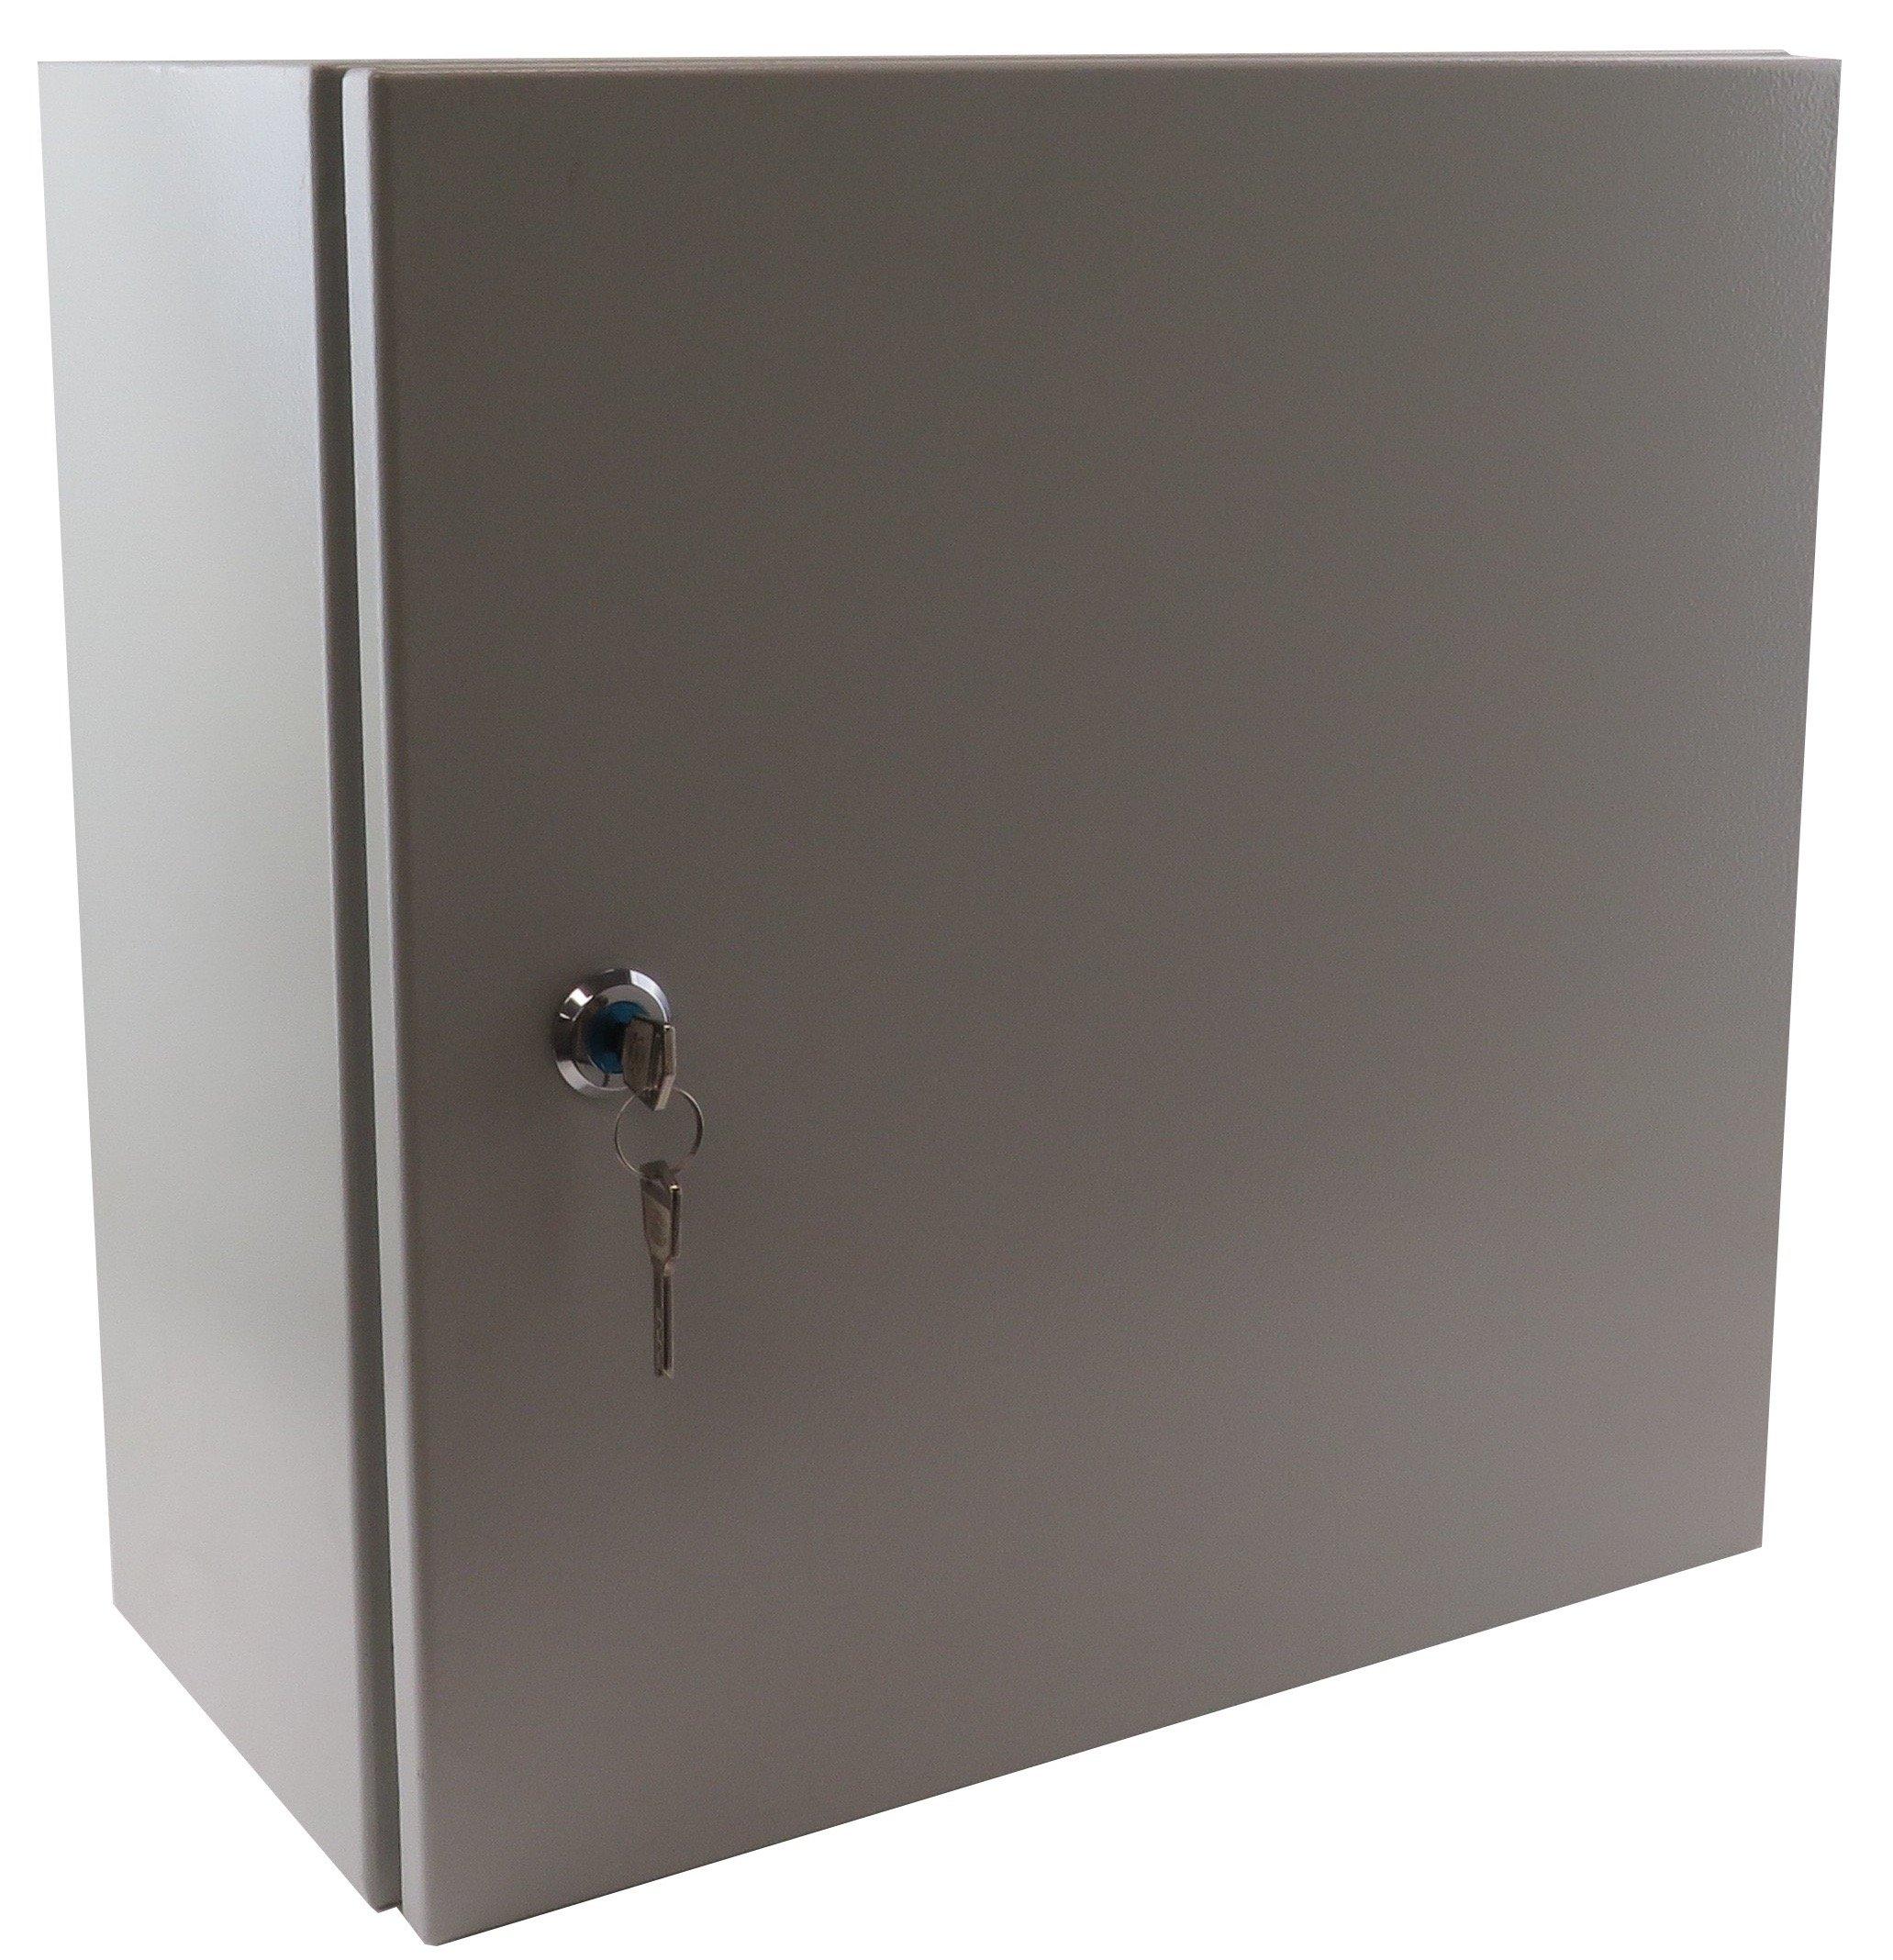 Yuco YC-16X12X8-UL-EL-2-KF IP66 Enclosure, UL Certified, Nema 4, 16 Gauge, Single Door Hinge Cover Wall-Mount, Standard Gray, Indoor/Outdoor, Backplate, Gland Plate, Lock and Key (16 x 12 x 8)